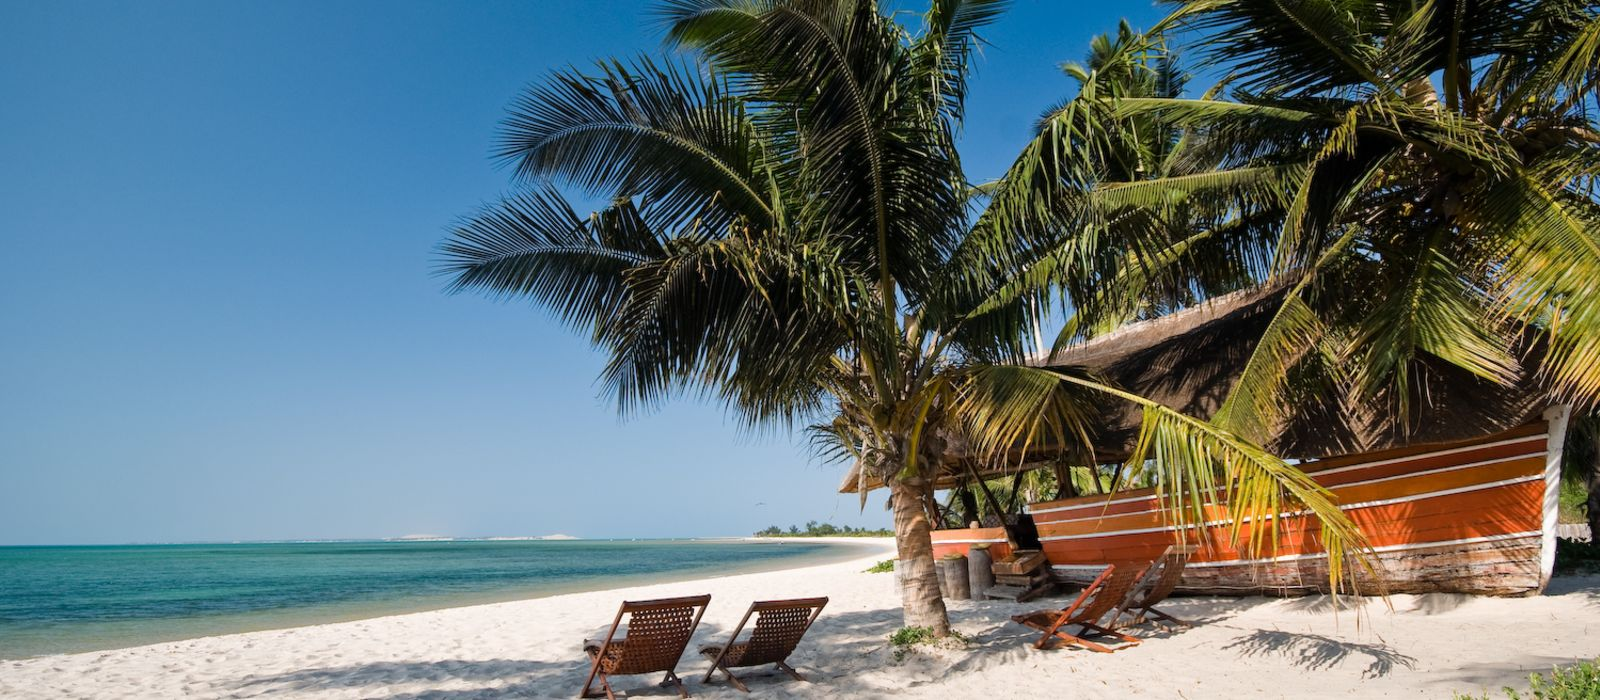 Malawi, Sambia und Mosambik: Safari, Malawisee und Strand Urlaub 5